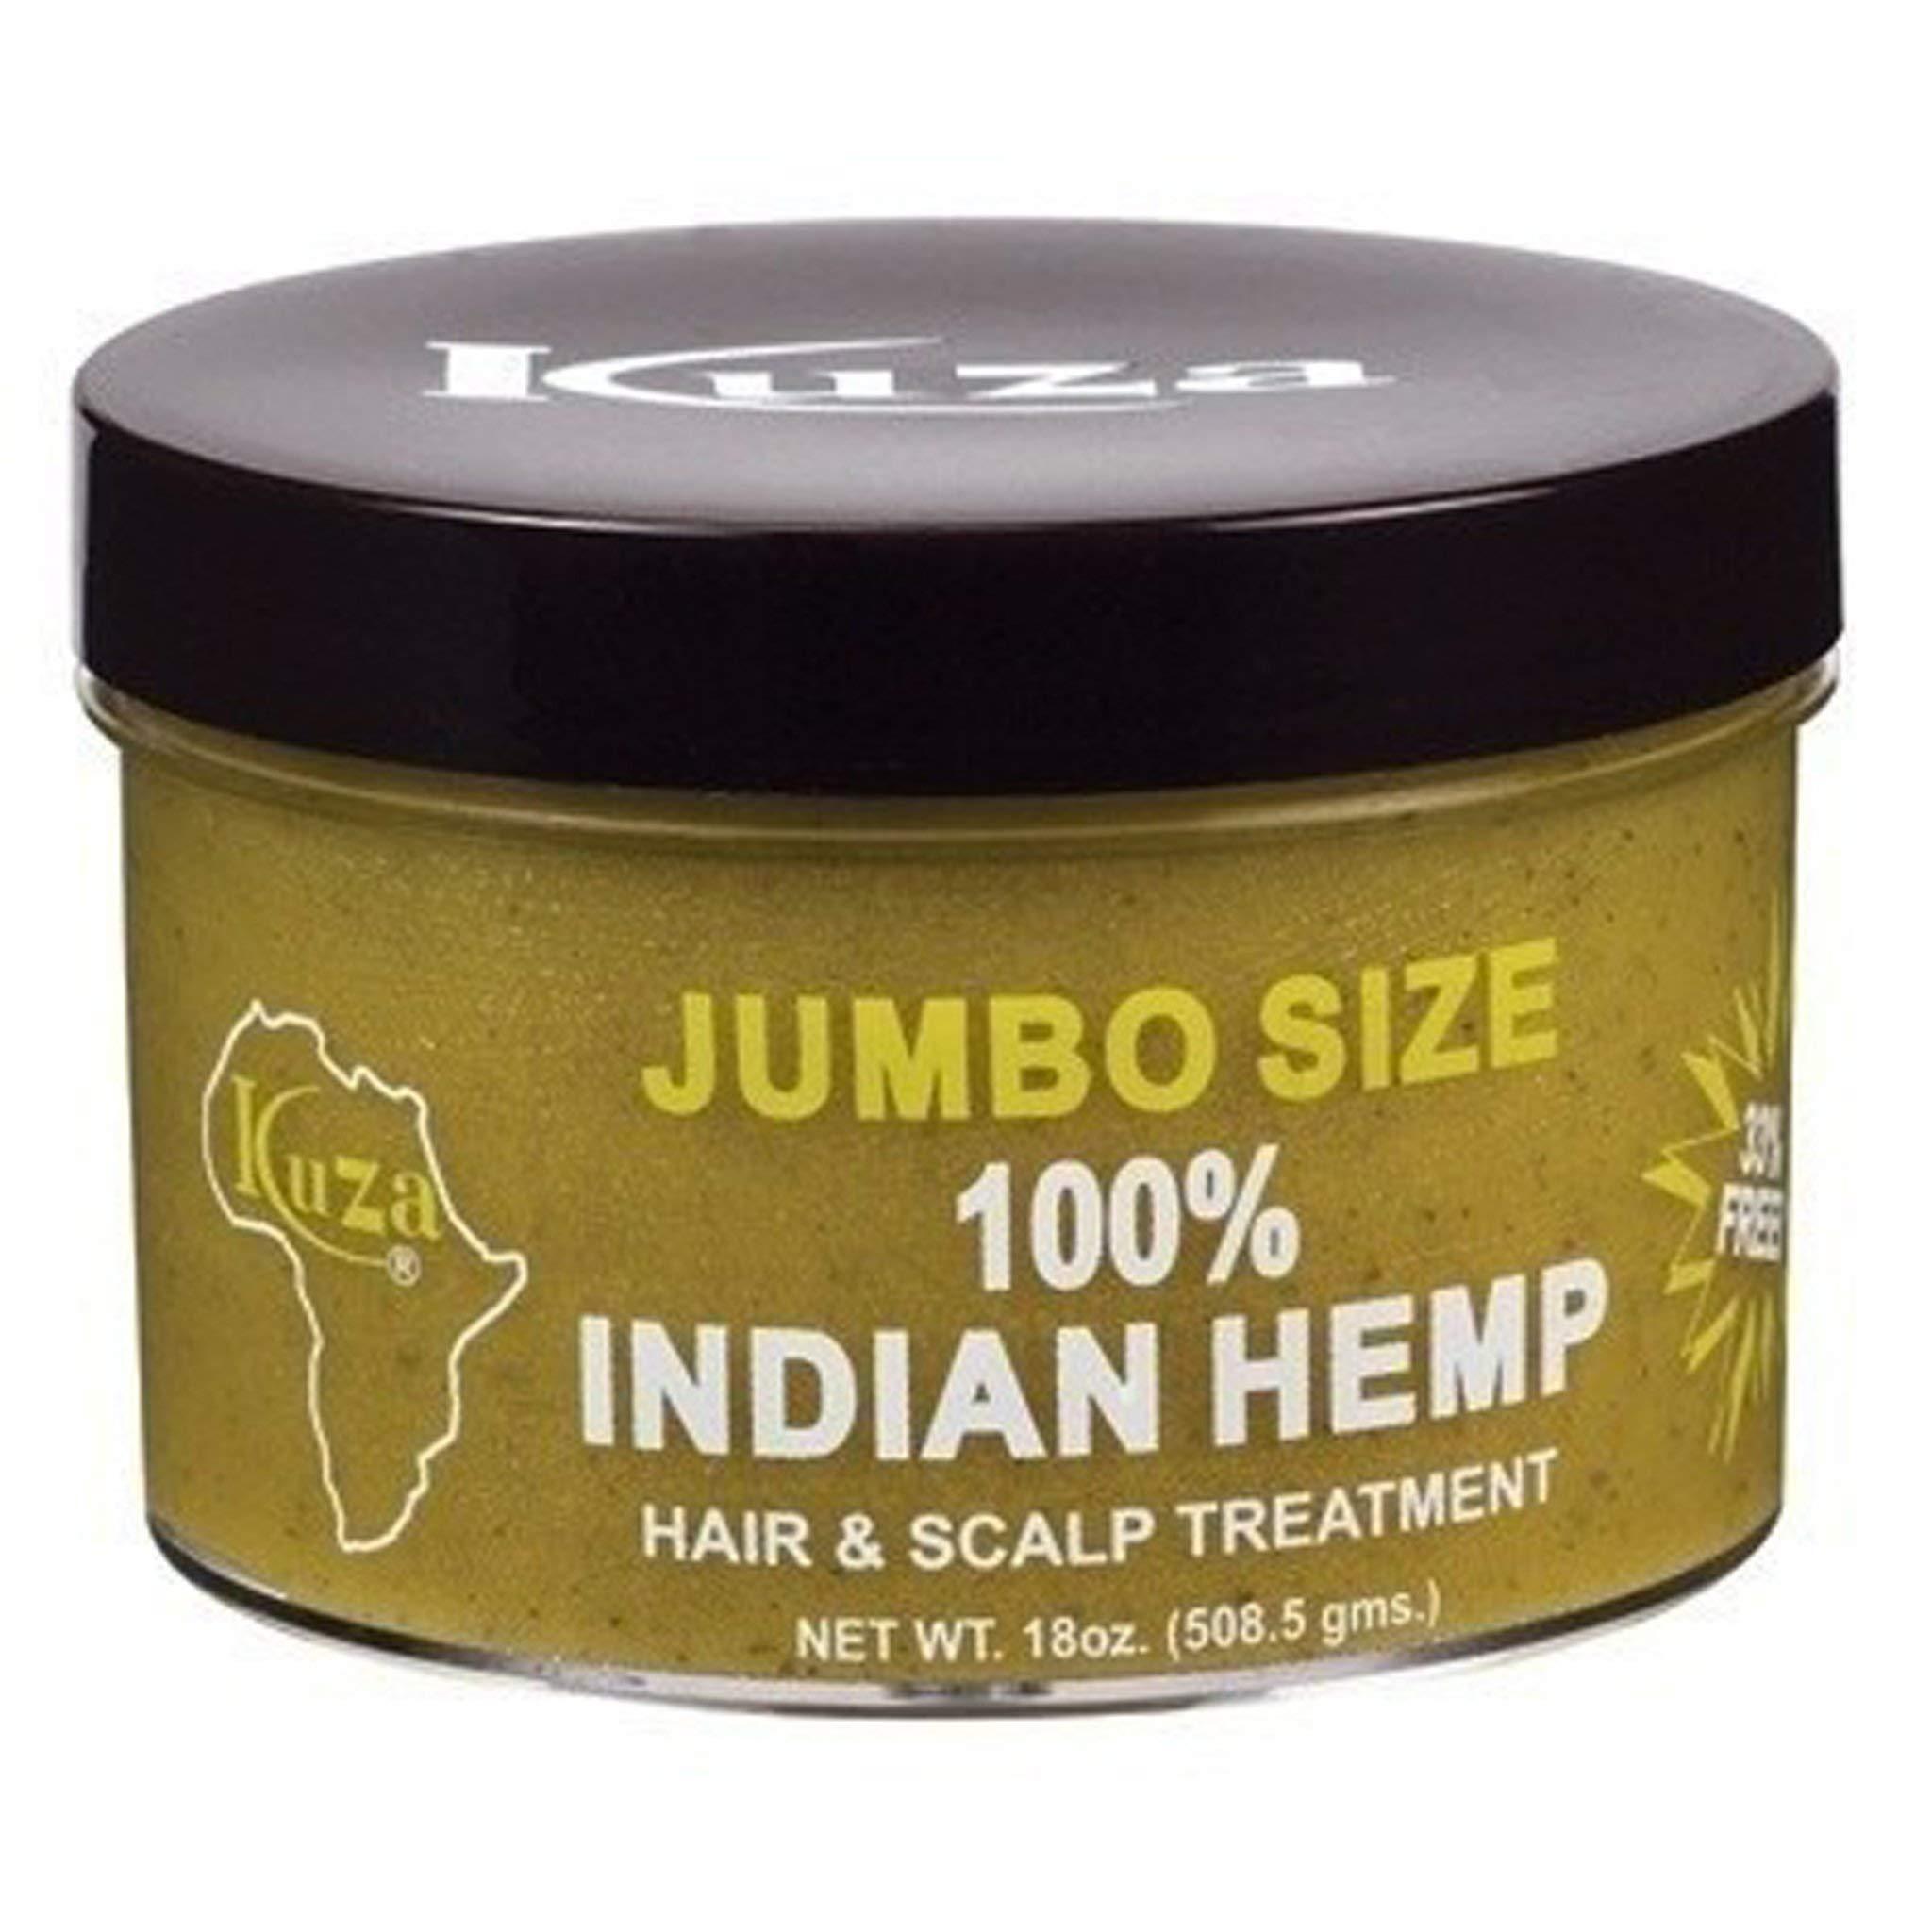 kuza 100 % indian hemp hair and scalp treatment 18 oz